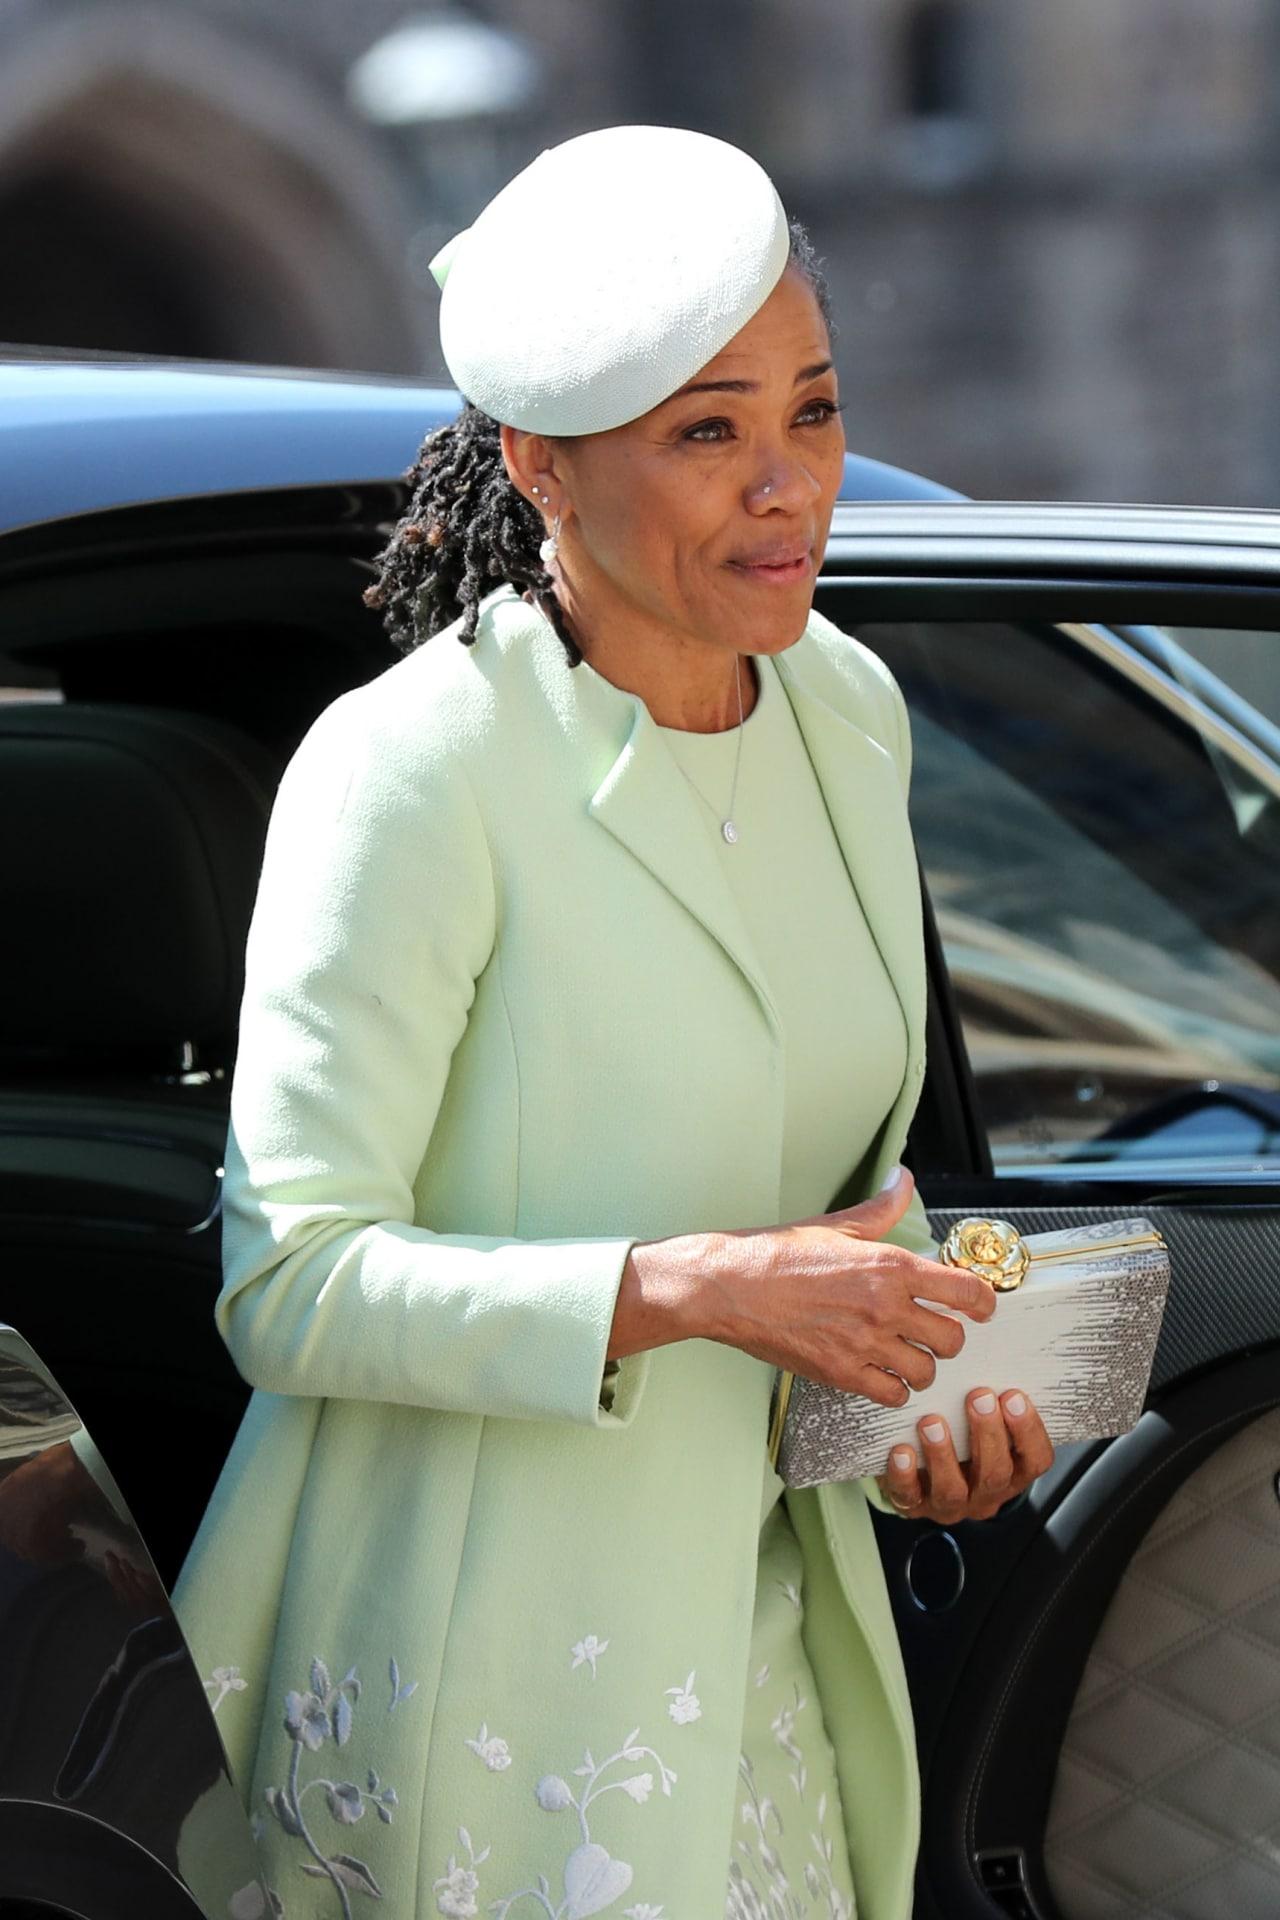 Royal Wedding Dress Meghan Markle.Meghan Markle S Mother Doria Ragland Brought Snacks To Her Royal